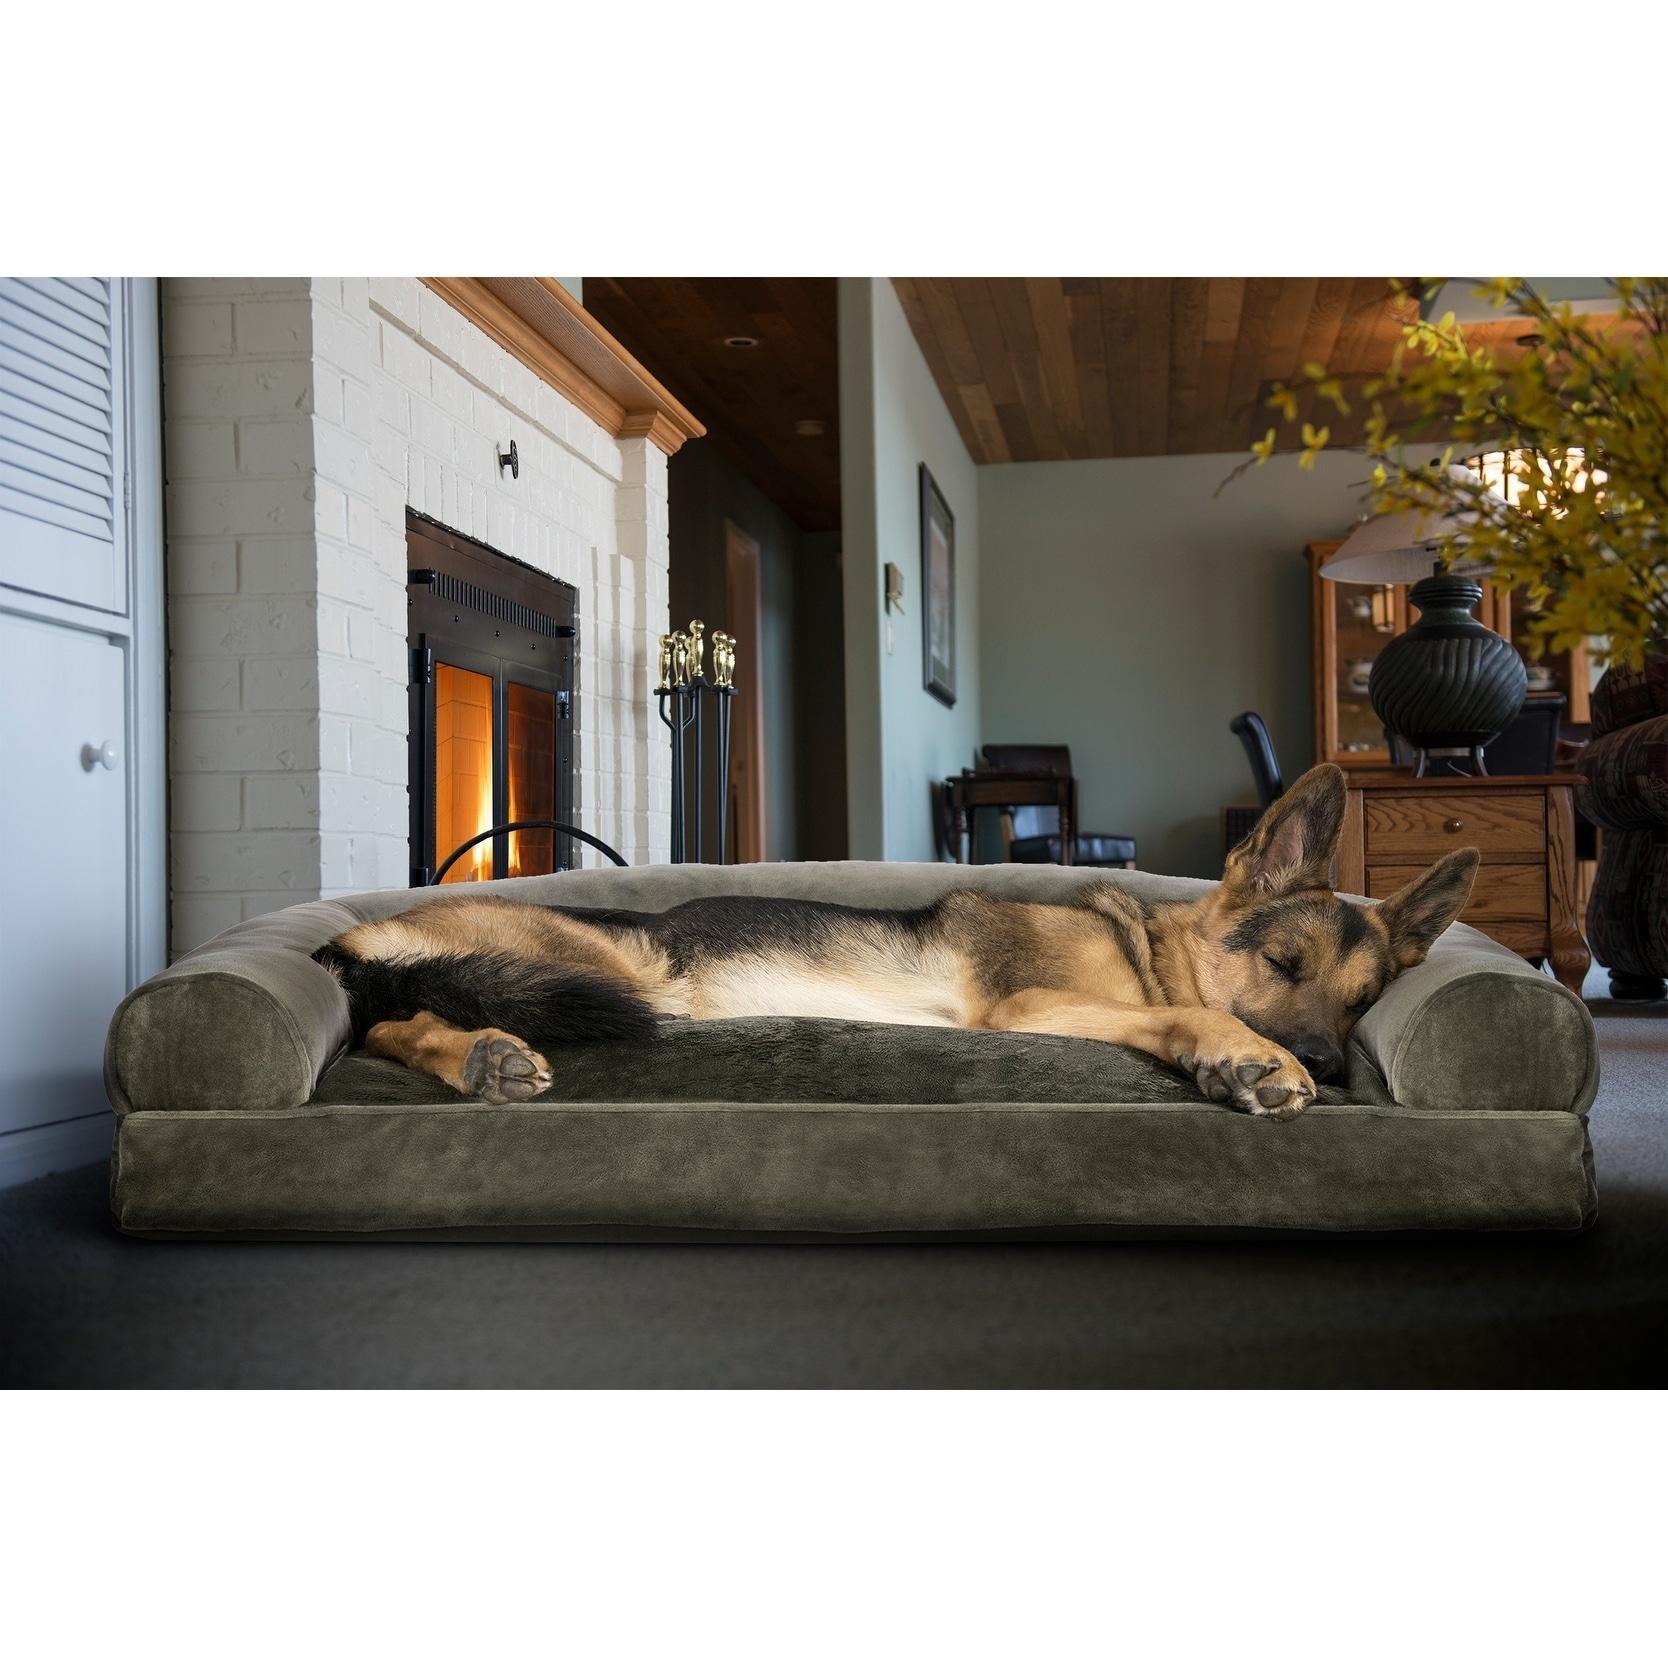 FurHaven Faux Fur U0026 Velvet Pillow Sofa Dog Bed Pet Bed